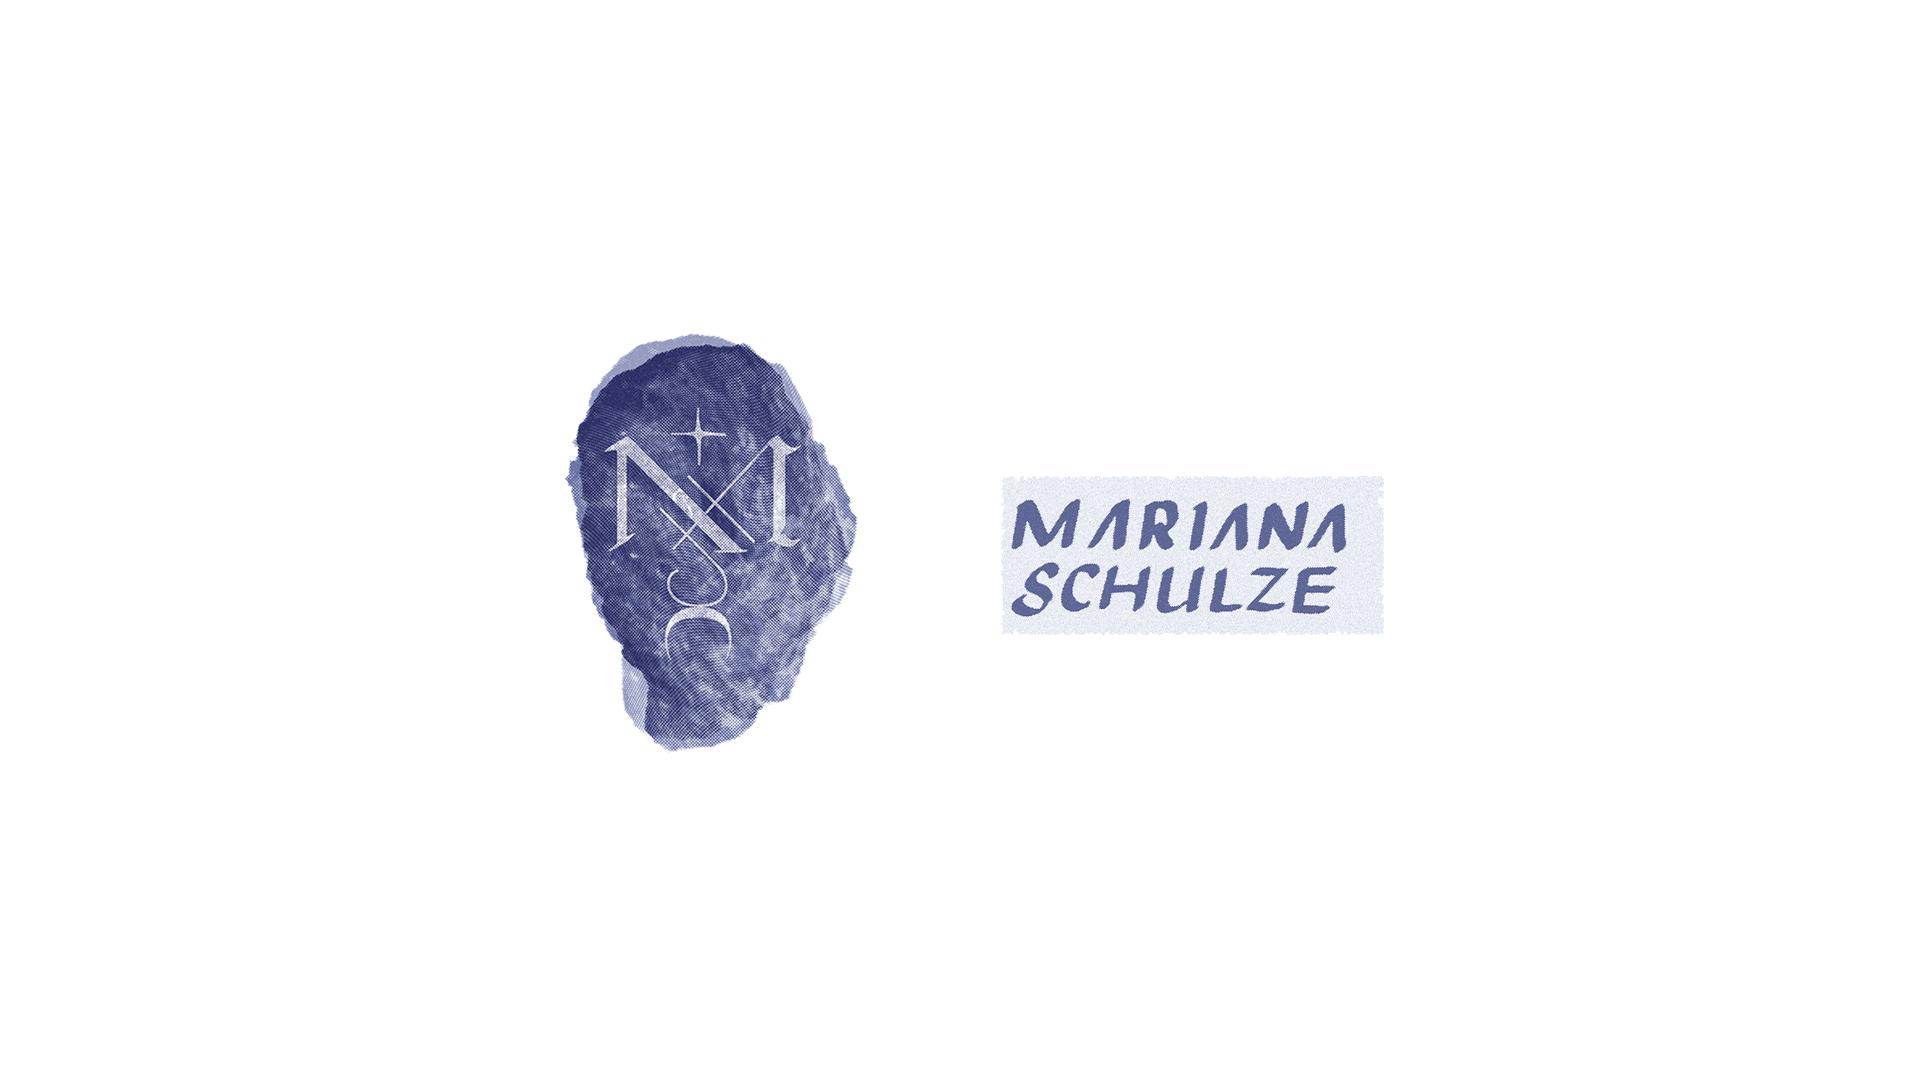 MARIANA-SCHULZE-WEB.jpg